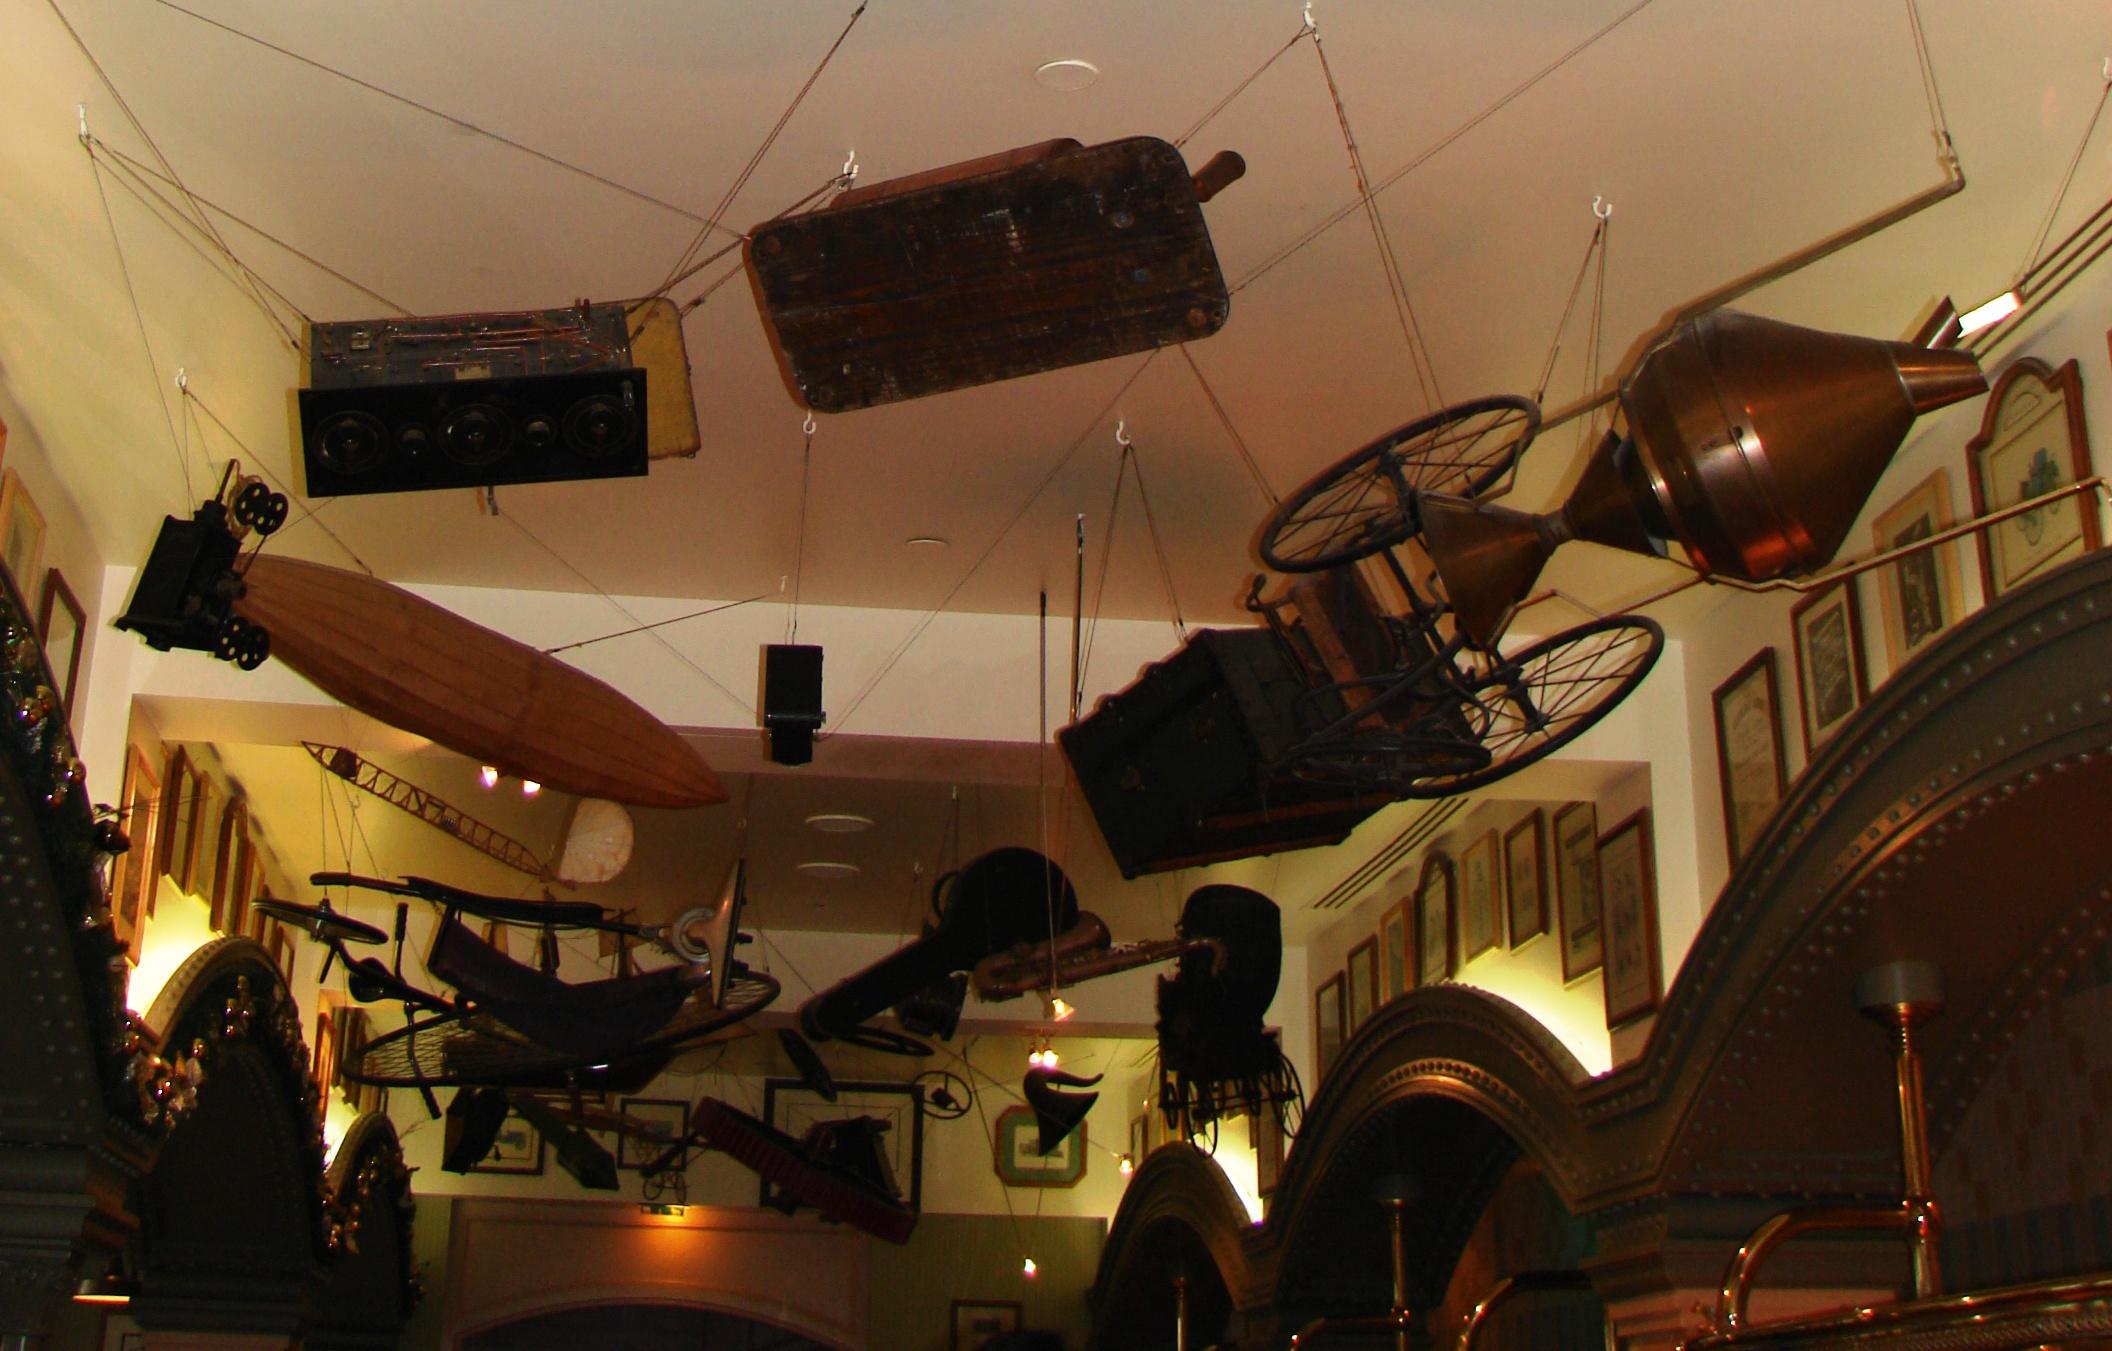 Restaurant inventions disneyland hotel disneyland paris parce que j 39 adore critiquer - Salon des inventions paris ...